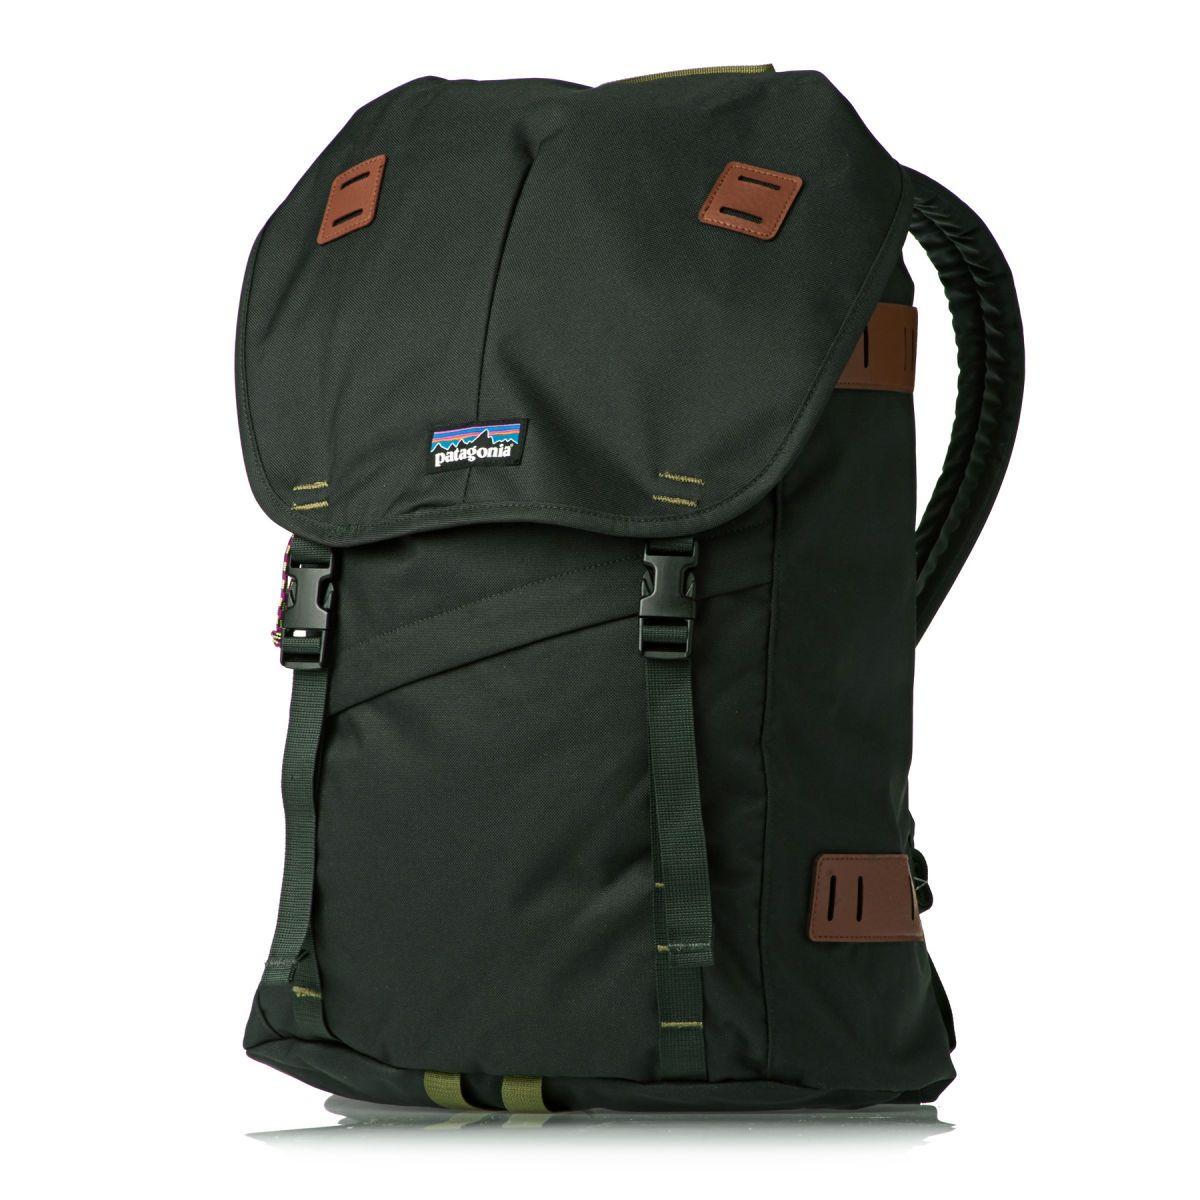 28a77a212367 Patagonia Backpacks - Patagonia Arbor Pack 26L Backpack - Rockwall ...